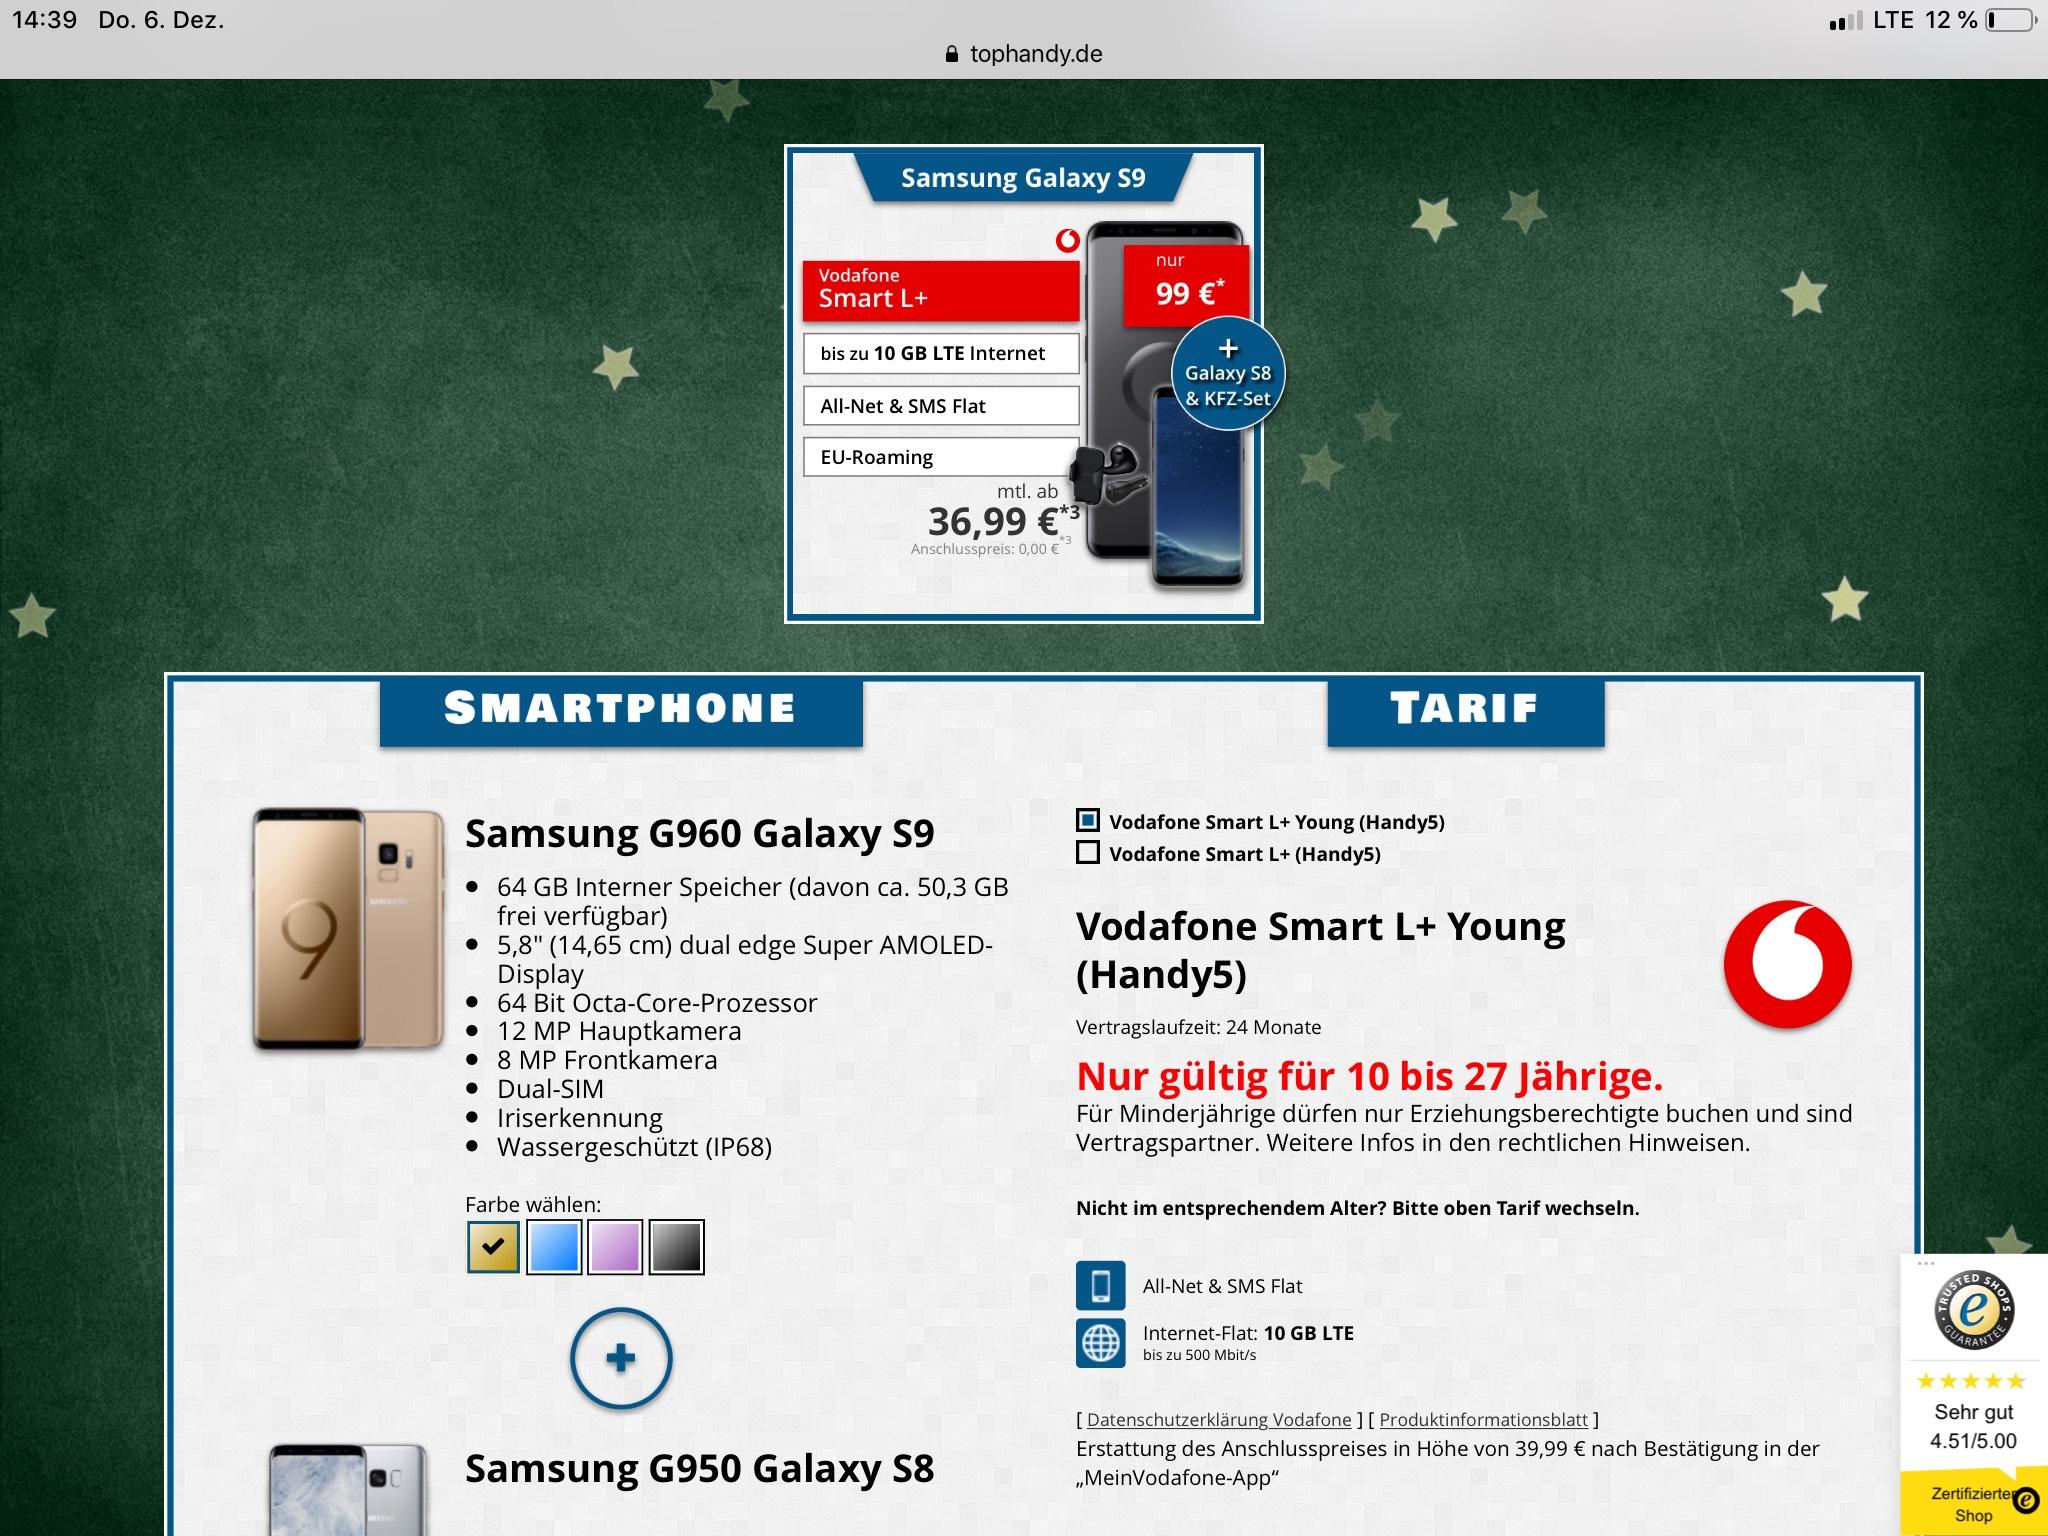 Samsung Galaxy S9 + Samsung Galaxy S8 + Samsung KFZ-Set USB-C im Vodafone Smart L+